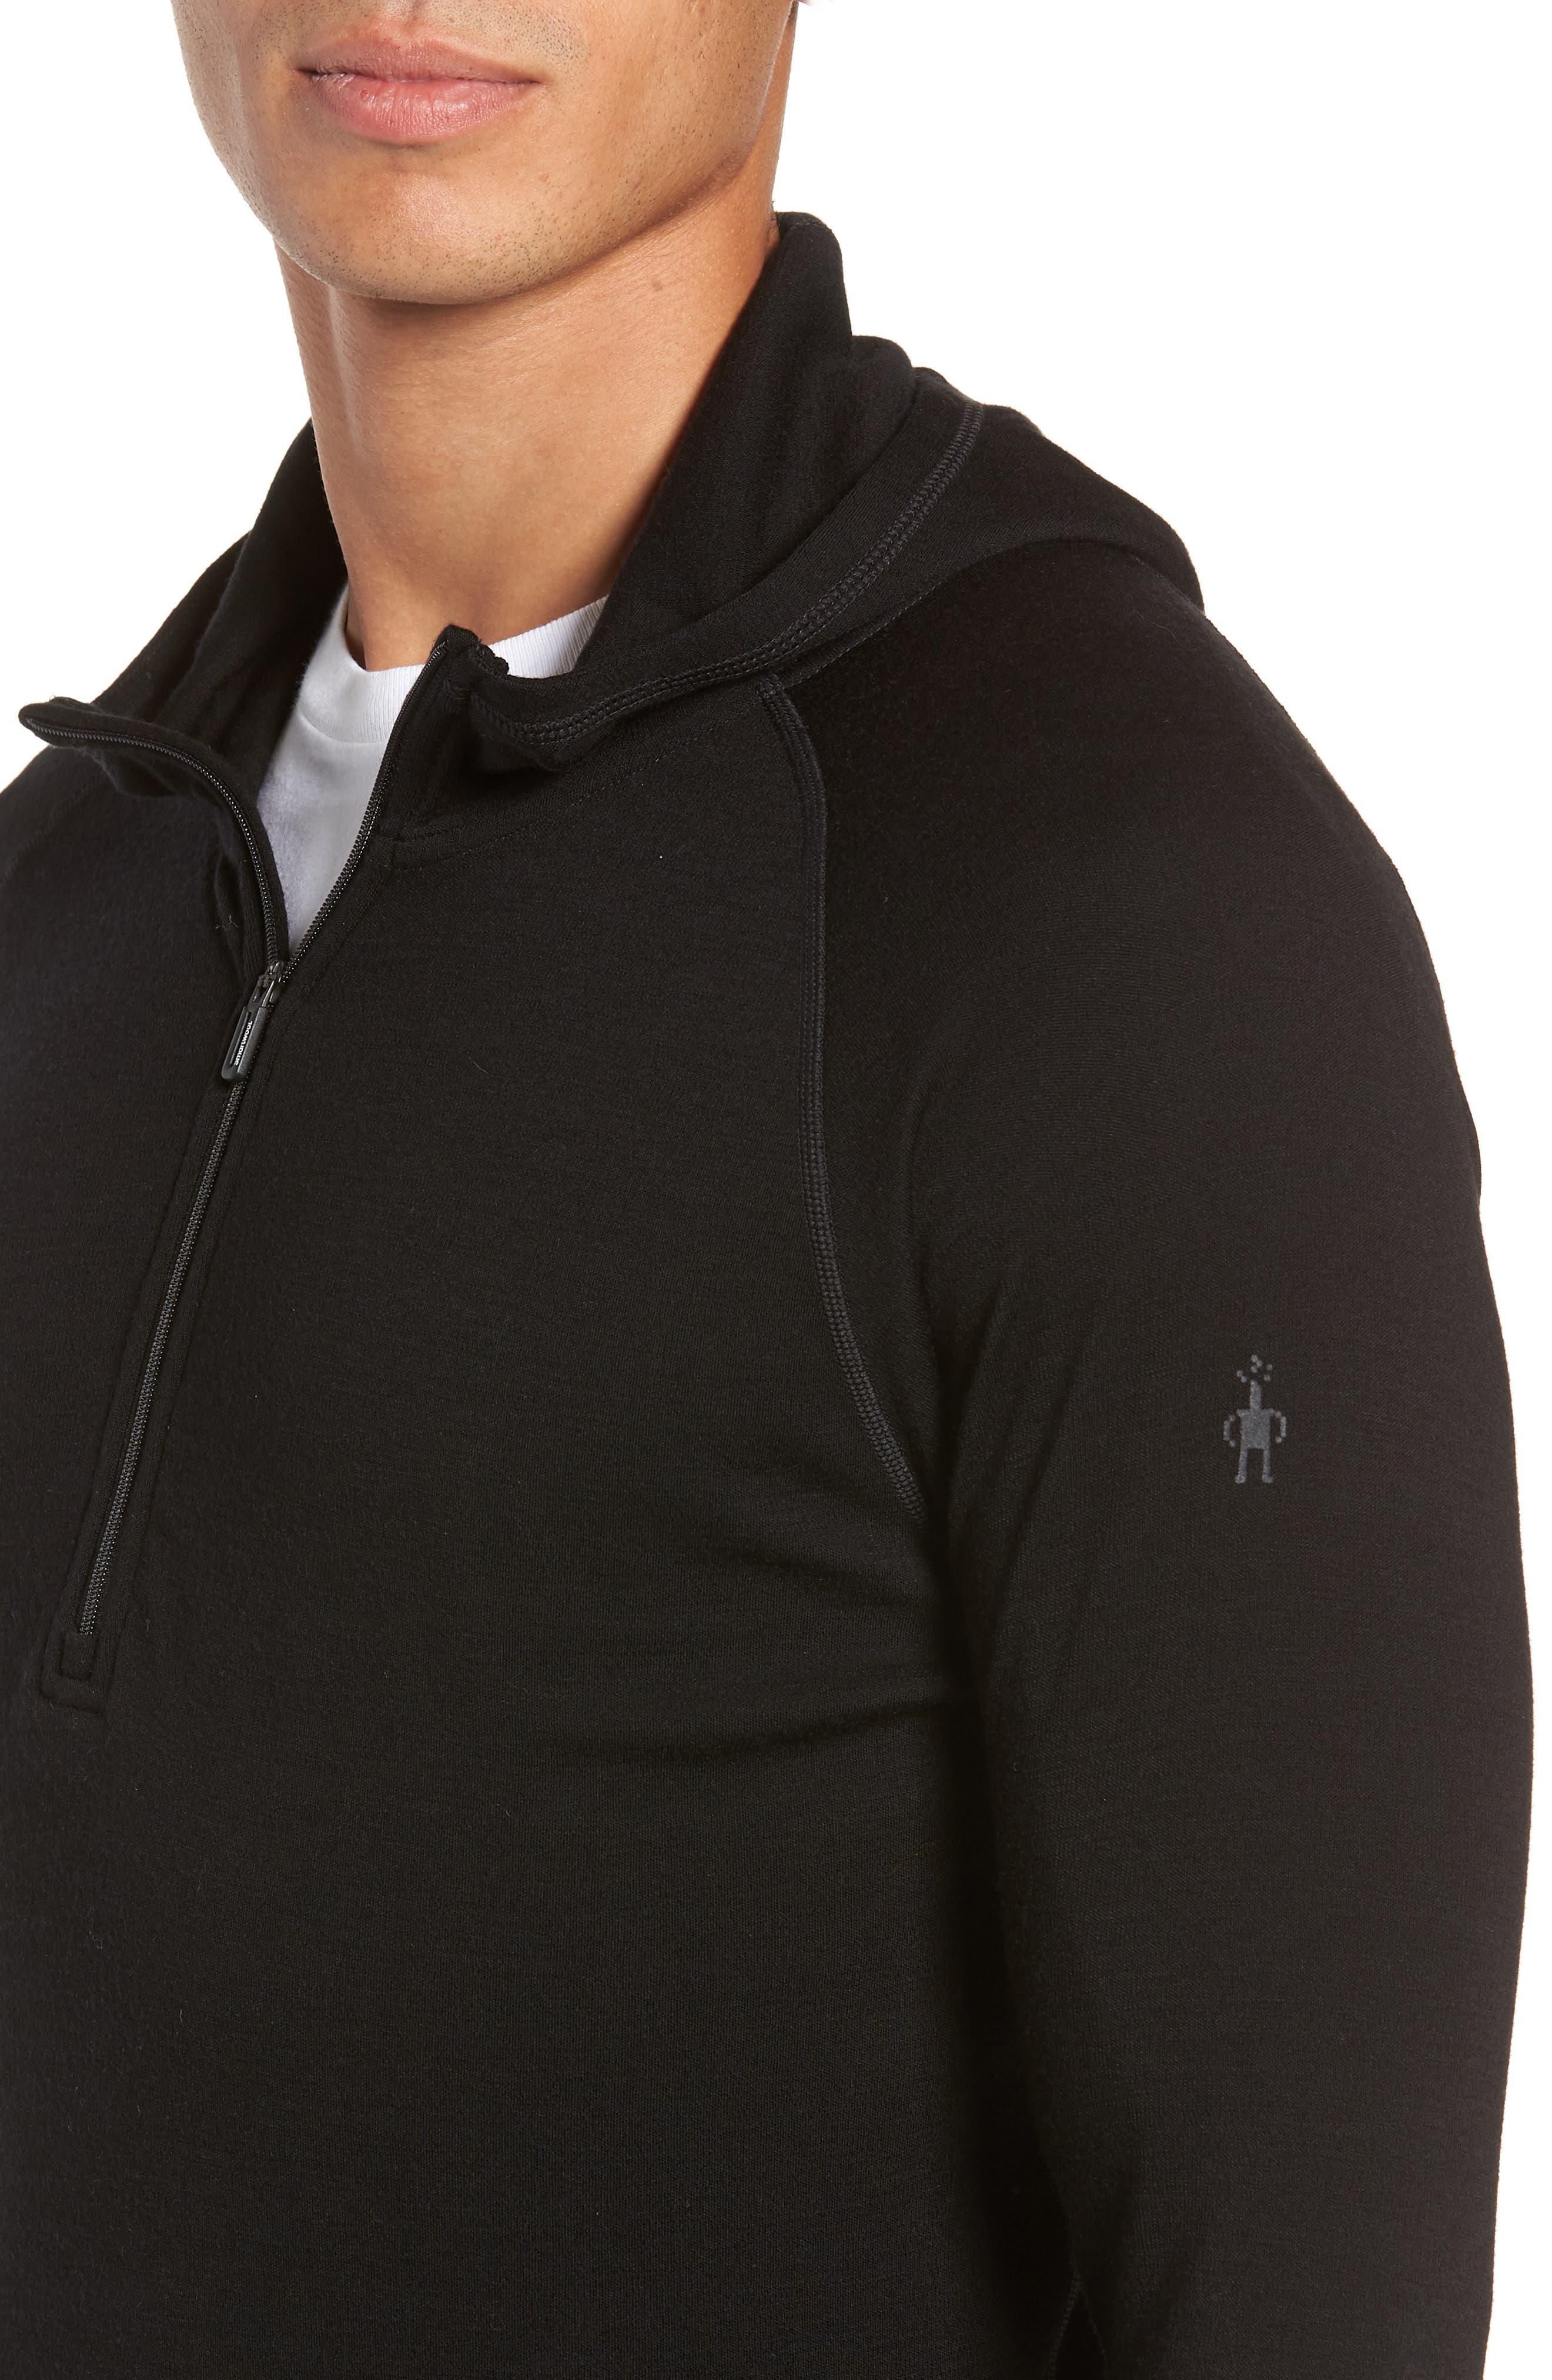 Merino 250 Base Layer Hooded Pullover,                             Alternate thumbnail 4, color,                             001